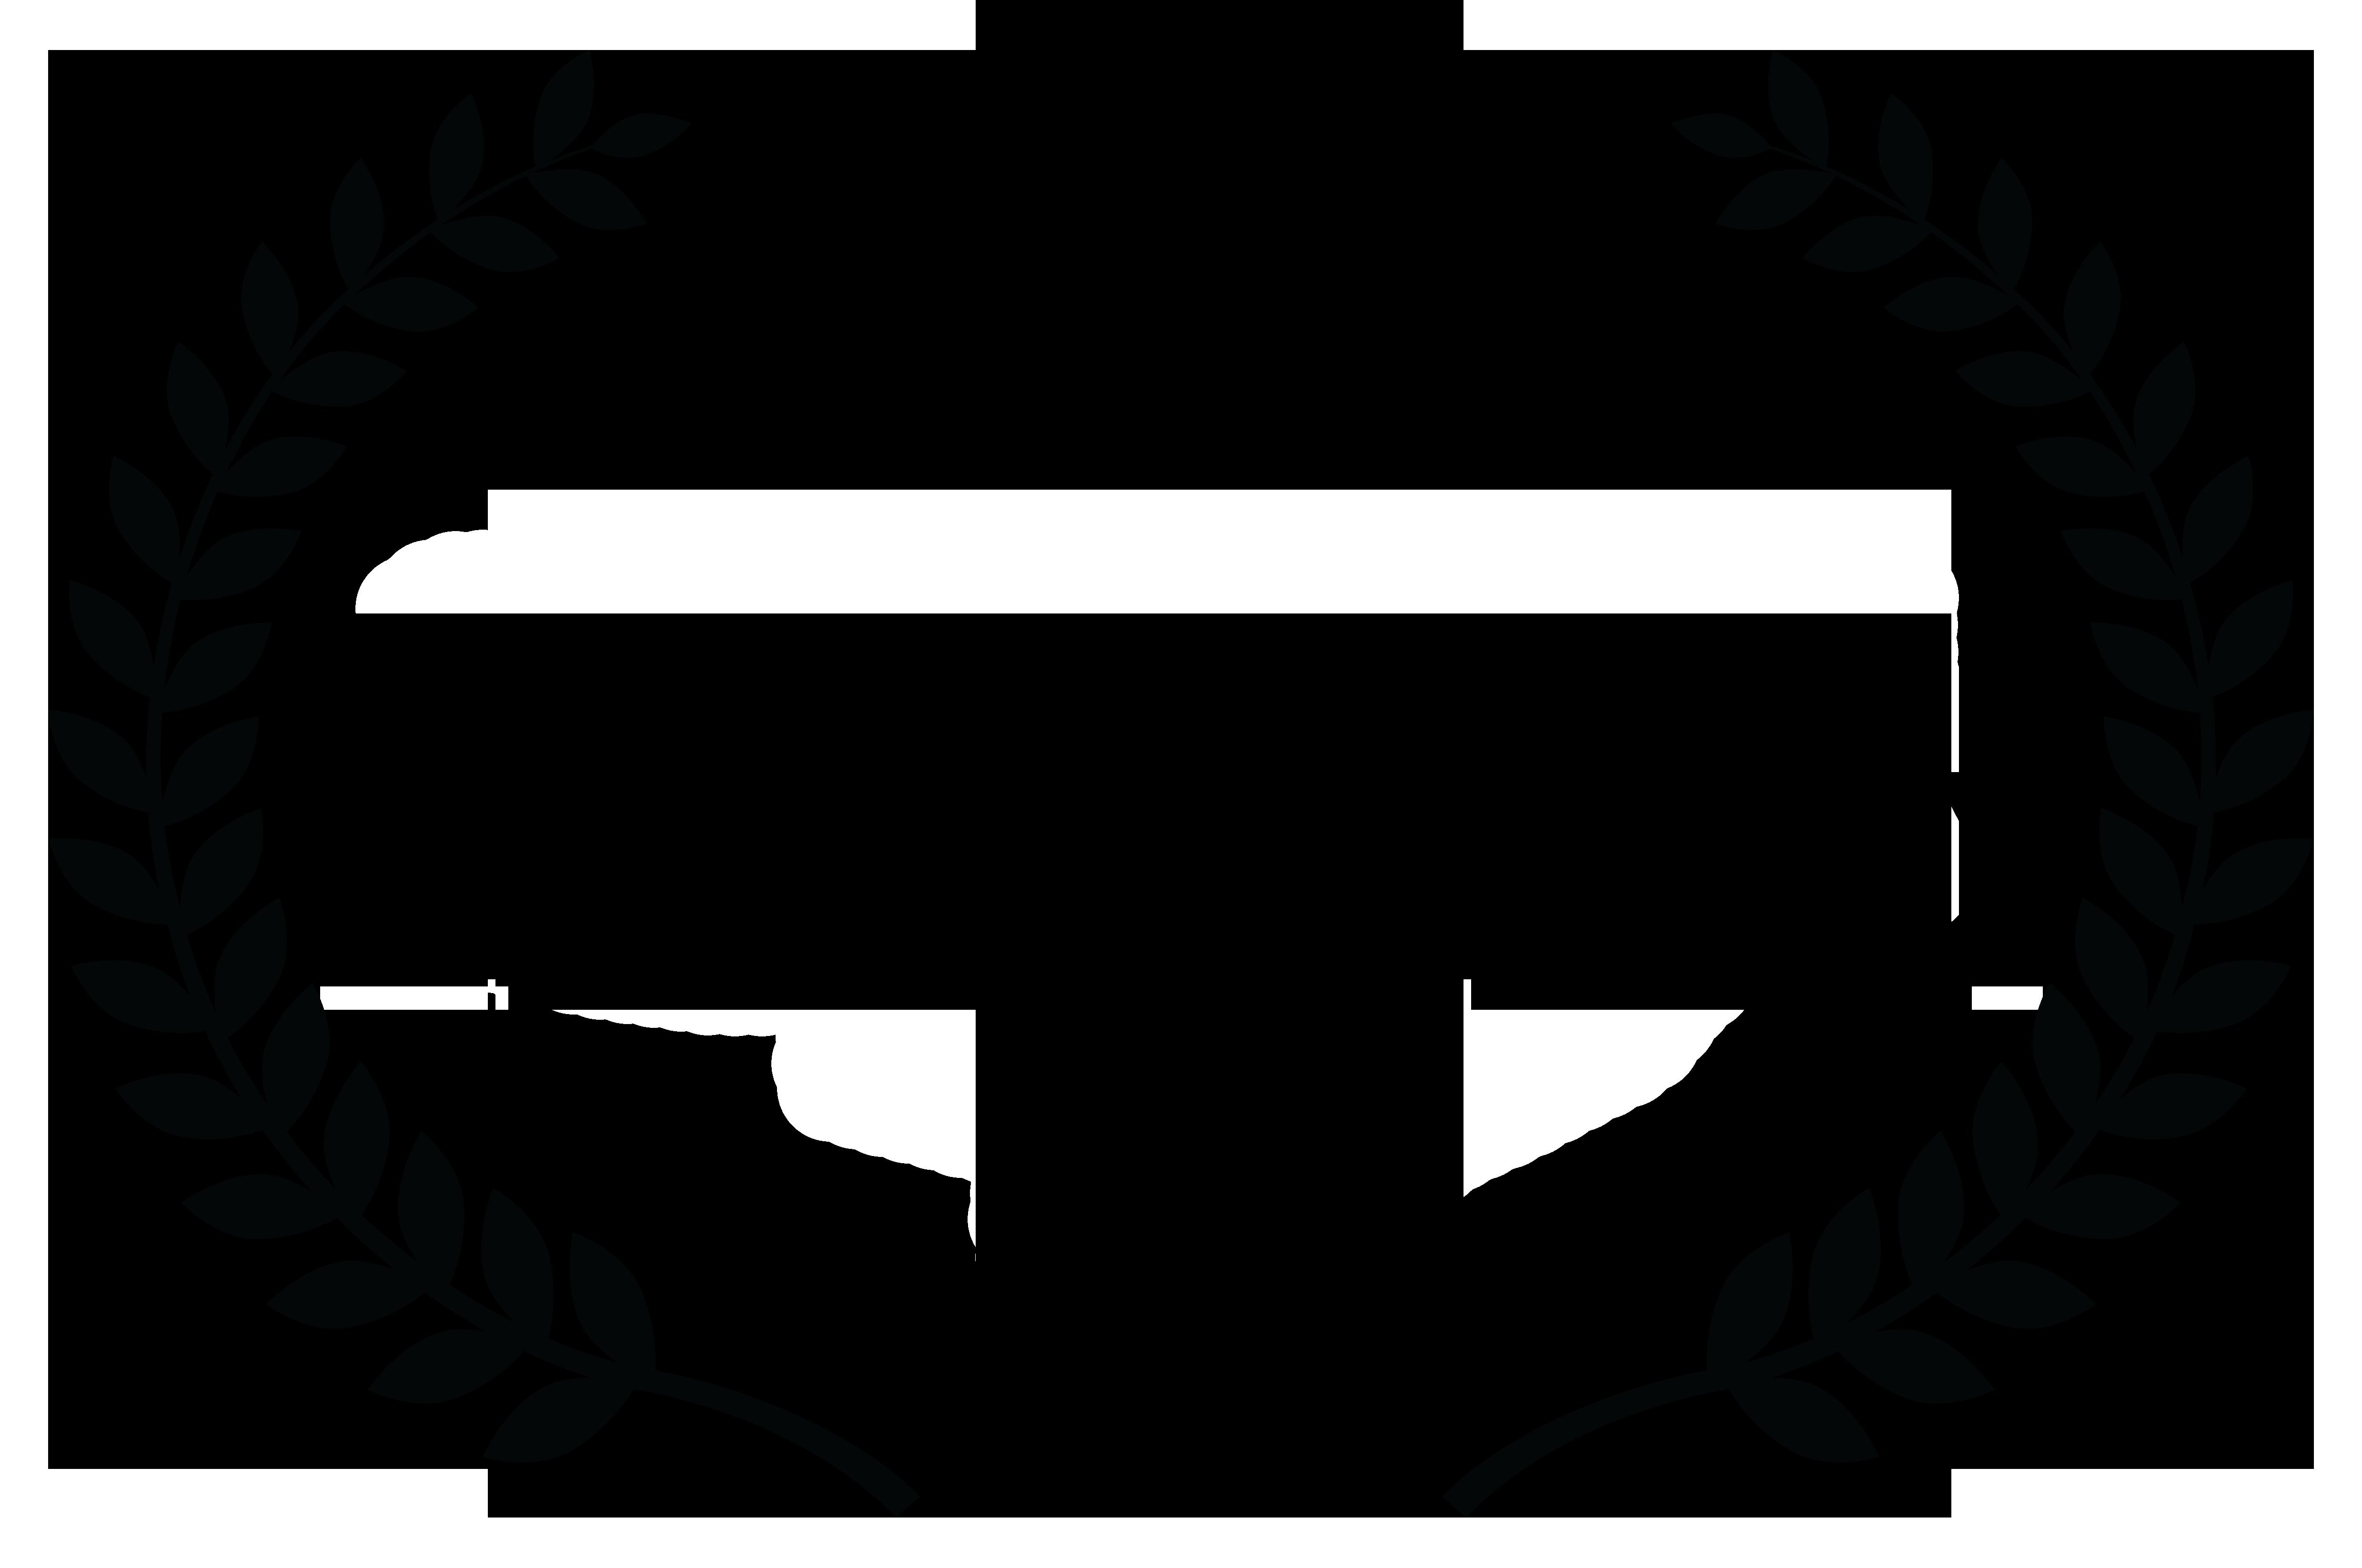 Ankara International Film Festival Best Screenplay Award, Best Actress Award (Ece Dizdar, Selen U�er)